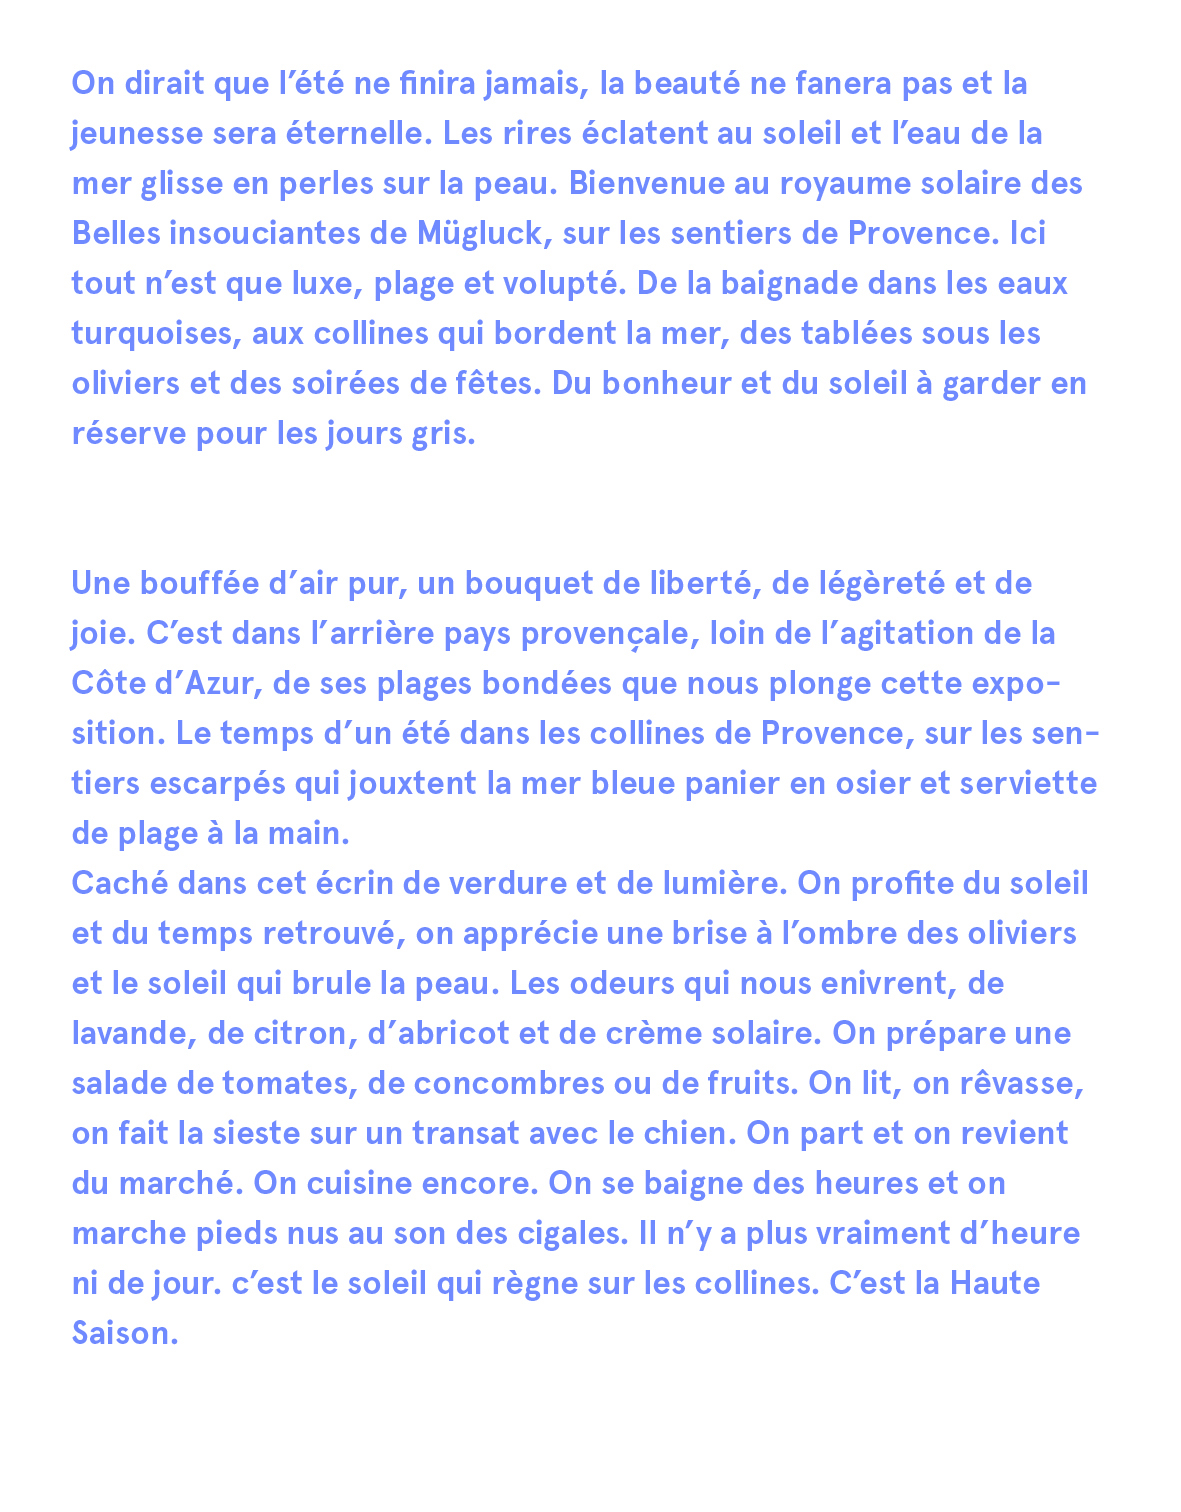 HAUTE_SAISON_Texte2.jpg